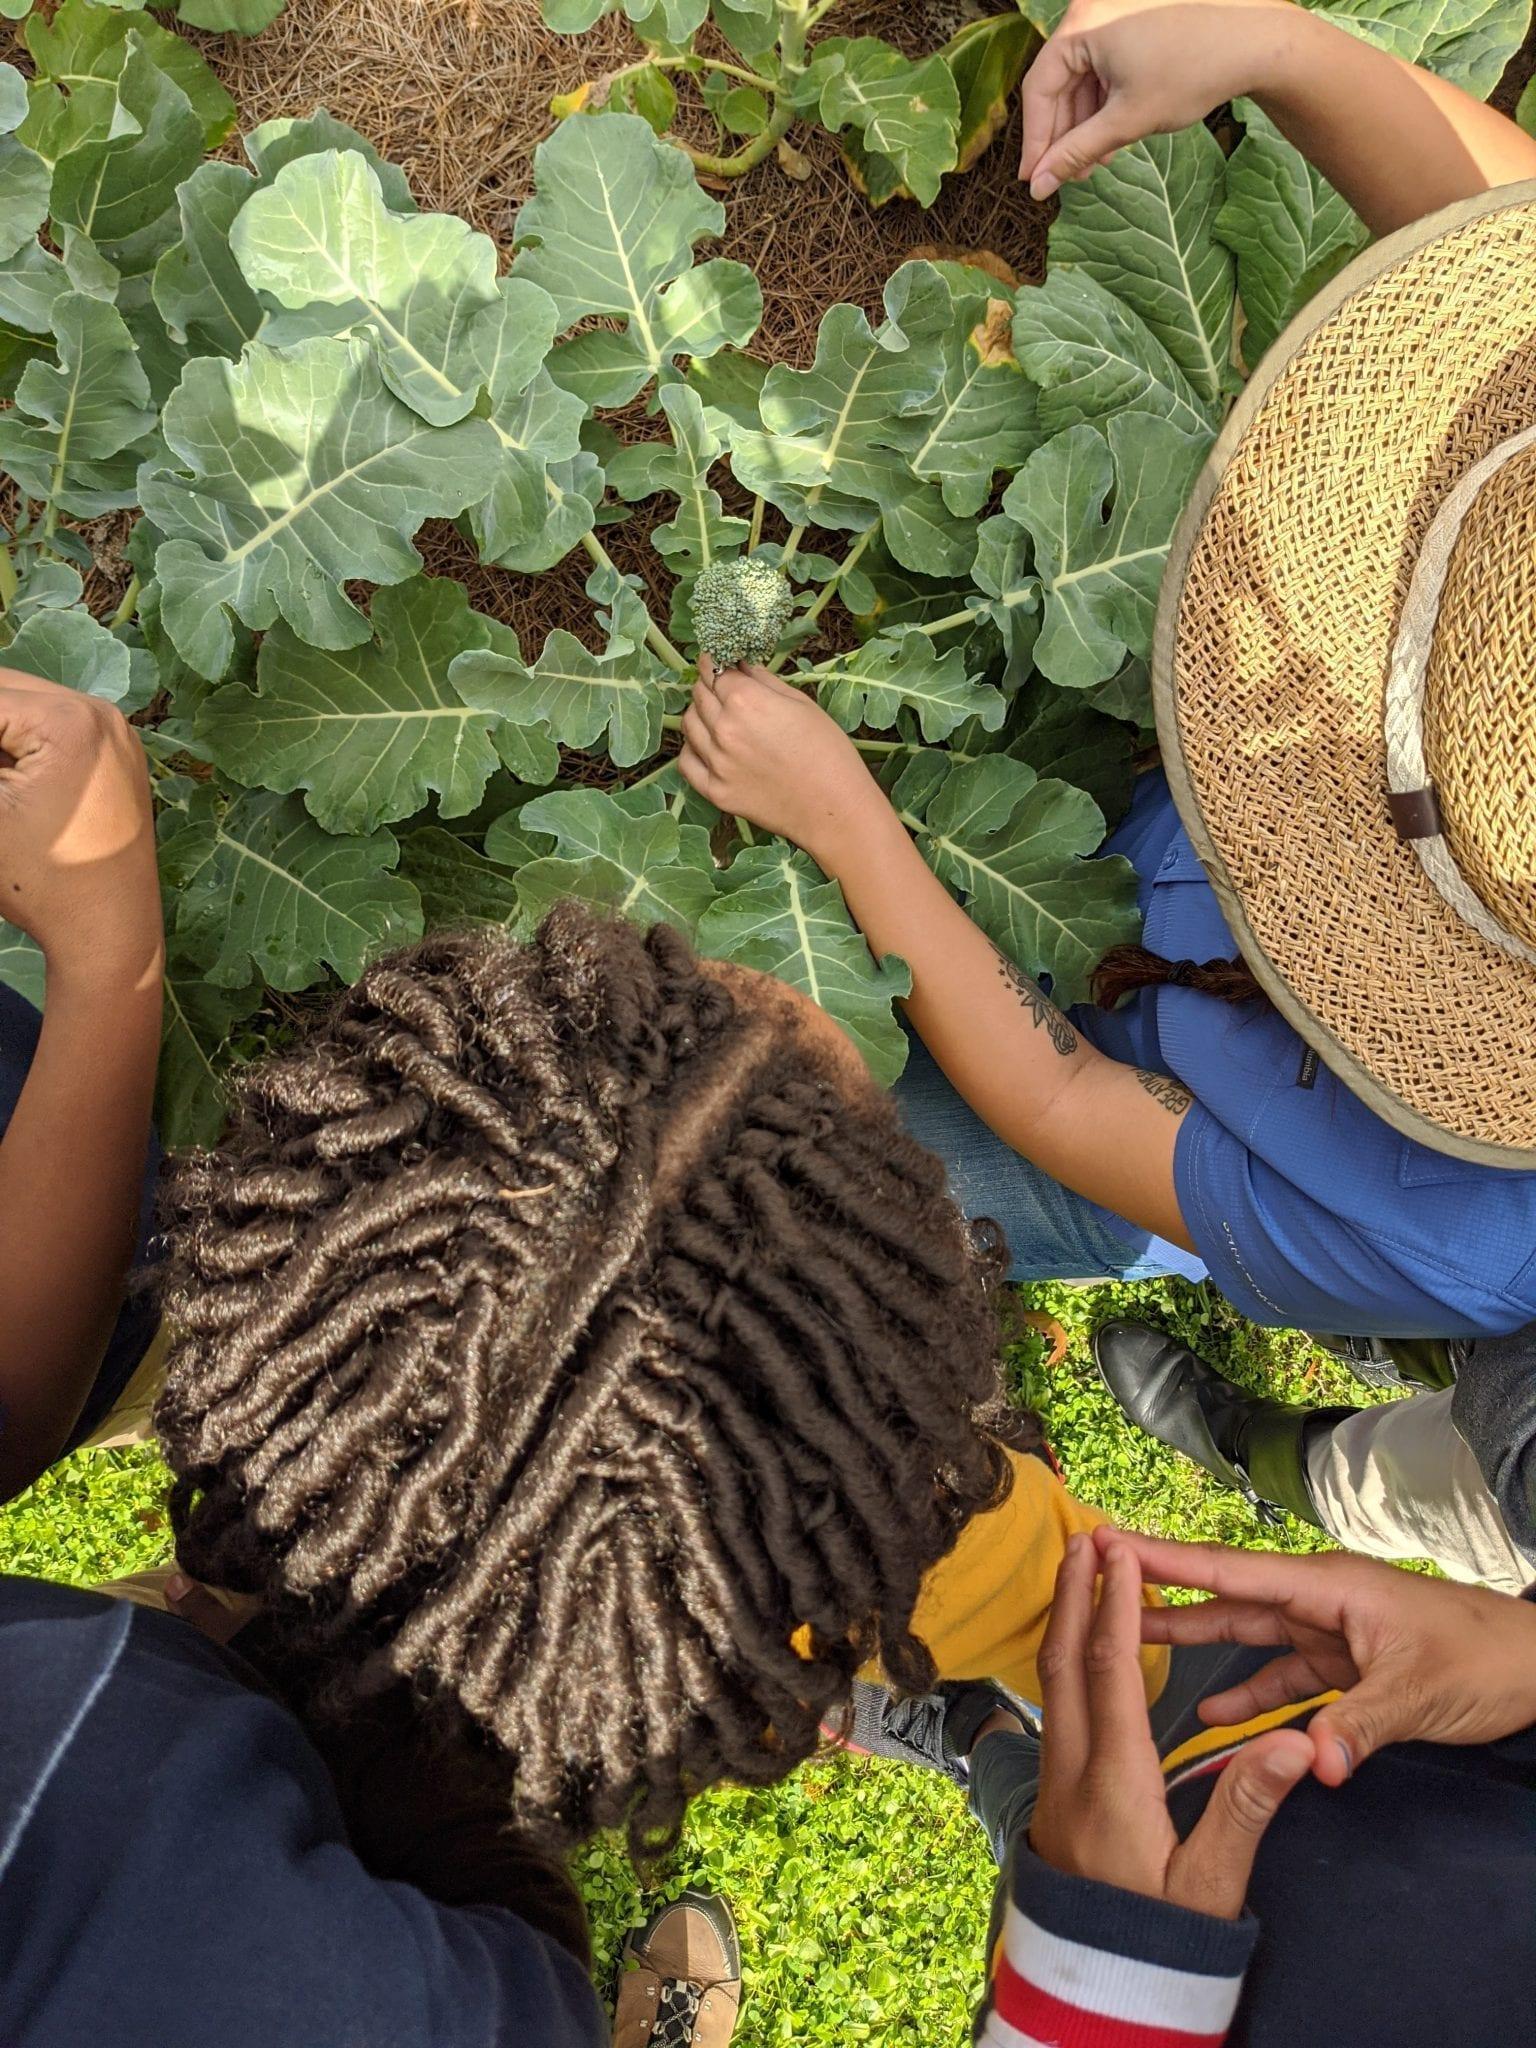 School Gardening during a Pandemic